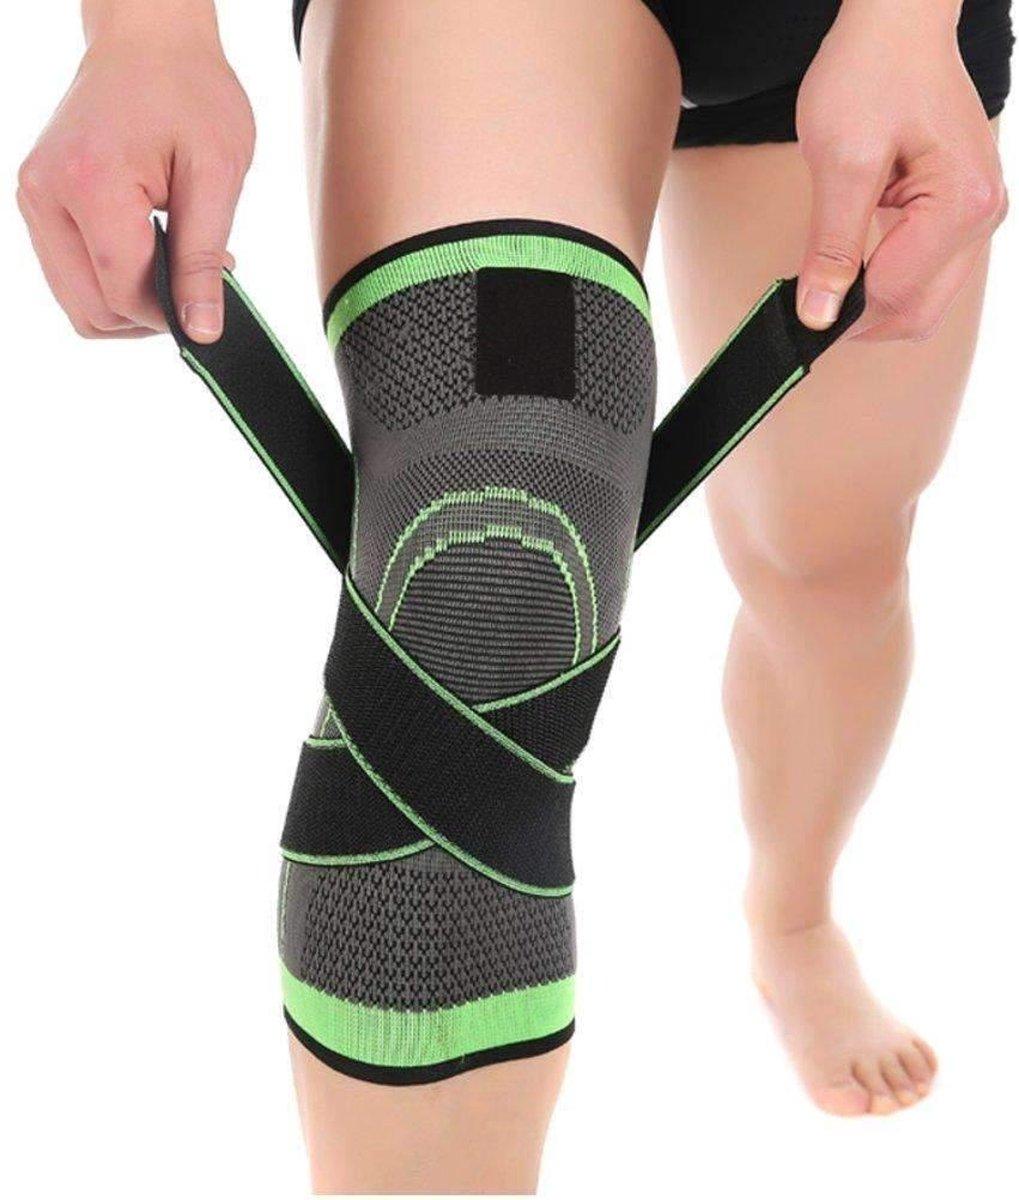 3D professionele kniebrace - Kniebrace sport - knieband - Compressieband - Kniebrace volwassenen - m